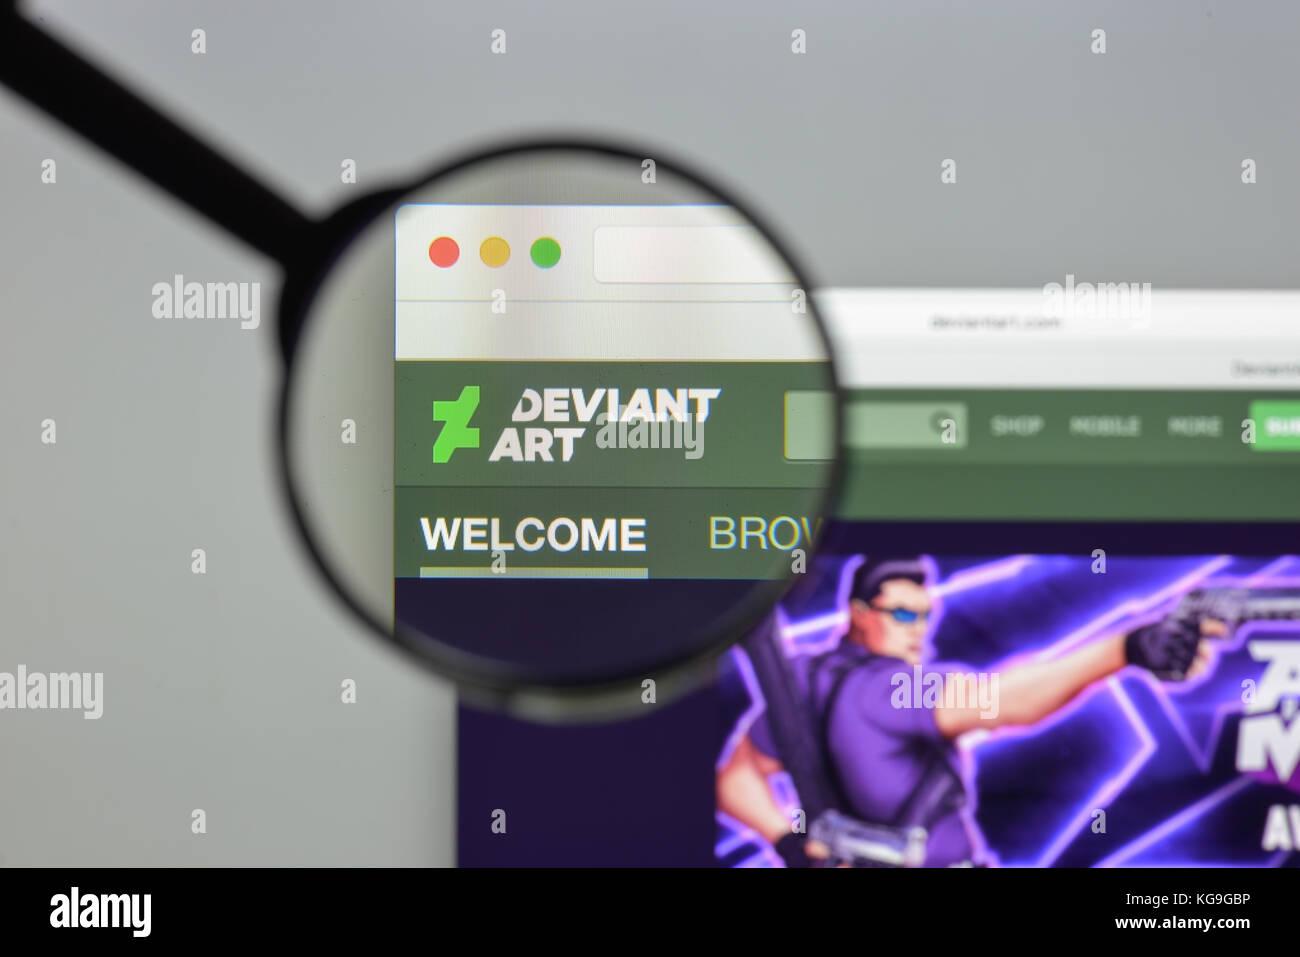 Milan, Italy - August 10, 2017: DeviantArt website homepage. Deviant Art logo visible. - Stock Image